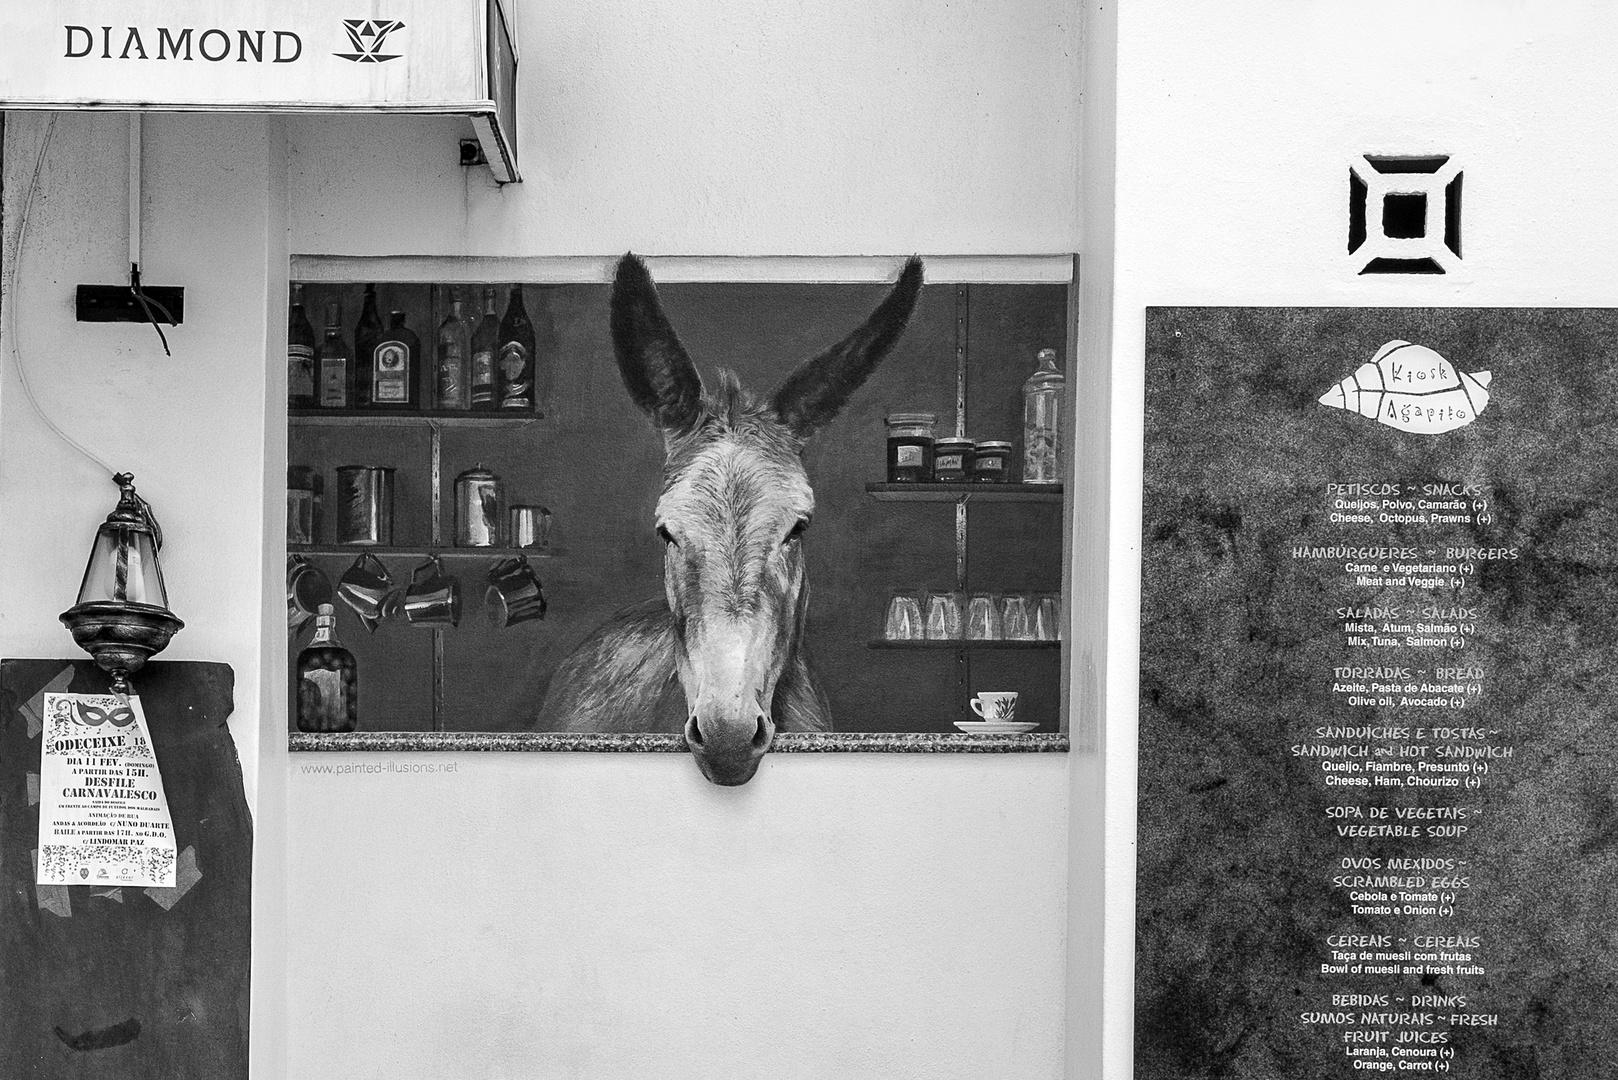 Portugal, Alentejo, Praia de Odeceixe, Imbiss Angebot vom Esel